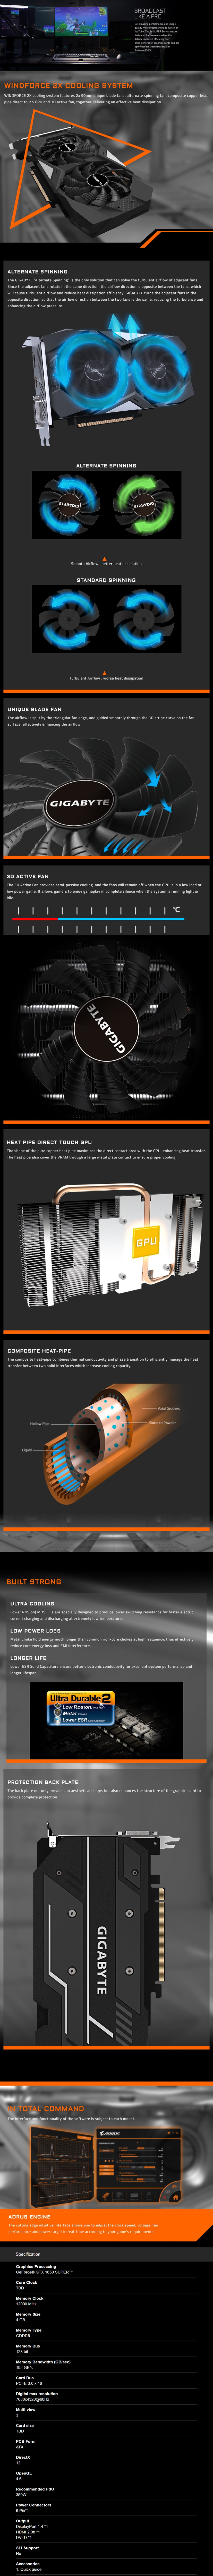 Gigabyte GeForce GTX 1650 SUPER WINDFORCE OC 4GB Video Card  - Overview 1